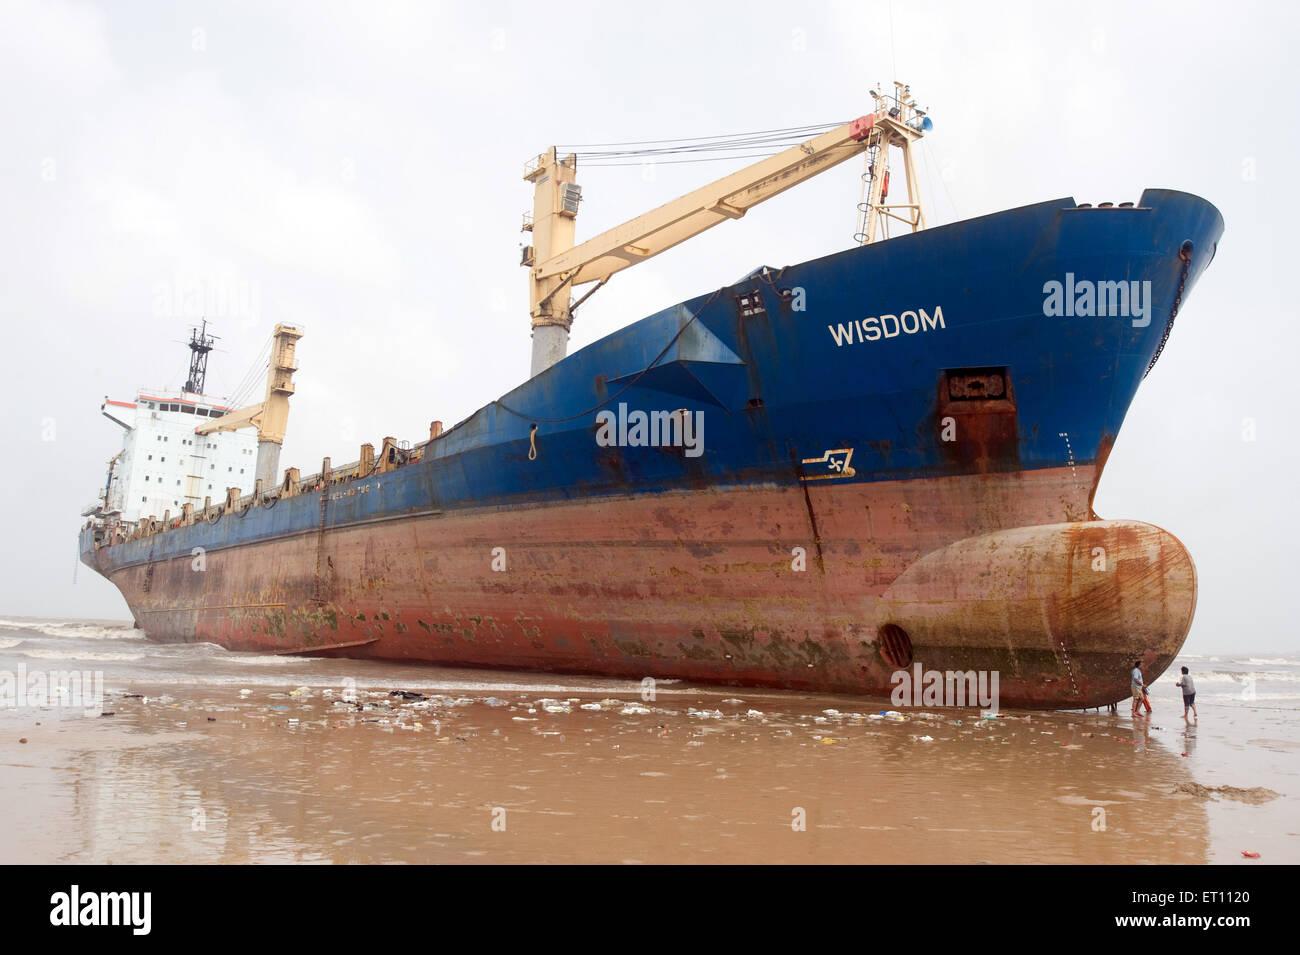 Wisdom the major cargo ship came at Juhu Beach Mumbai India Asia - Stock Image